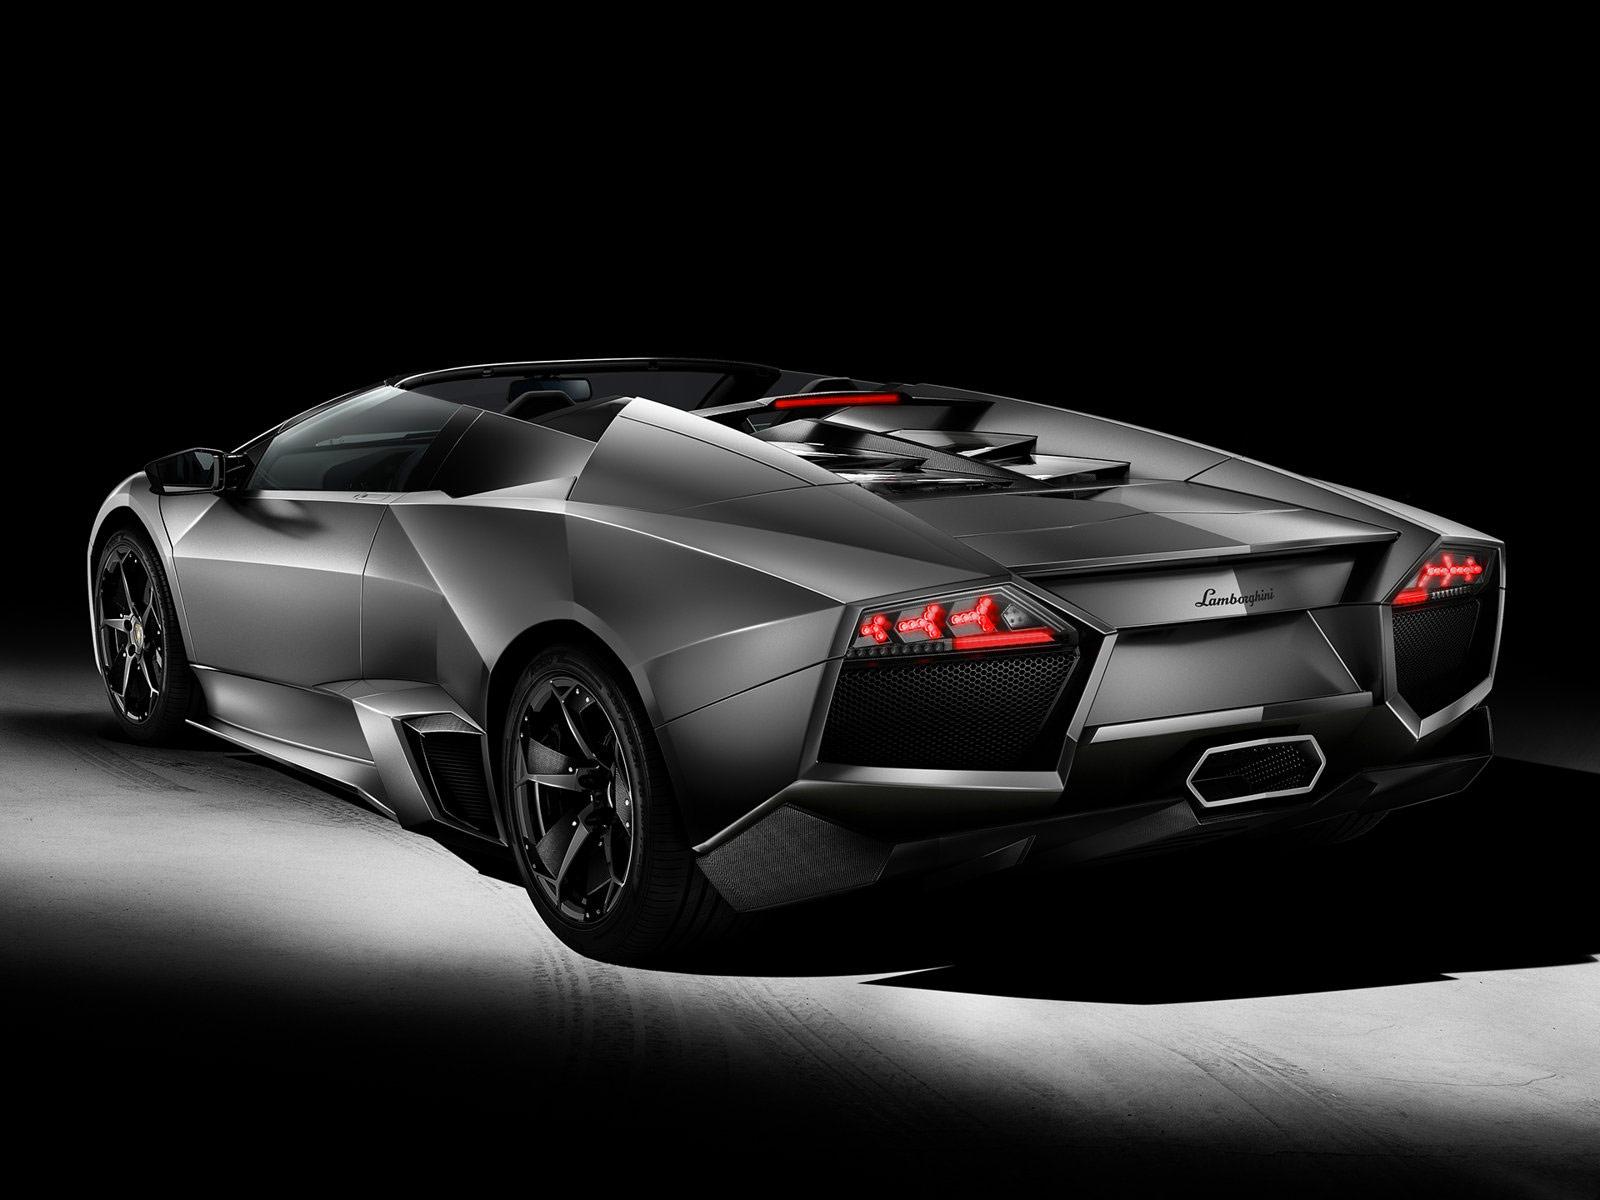 Lamborghini Reventon Roadster 2010 Luxury Of Automotive Fast And